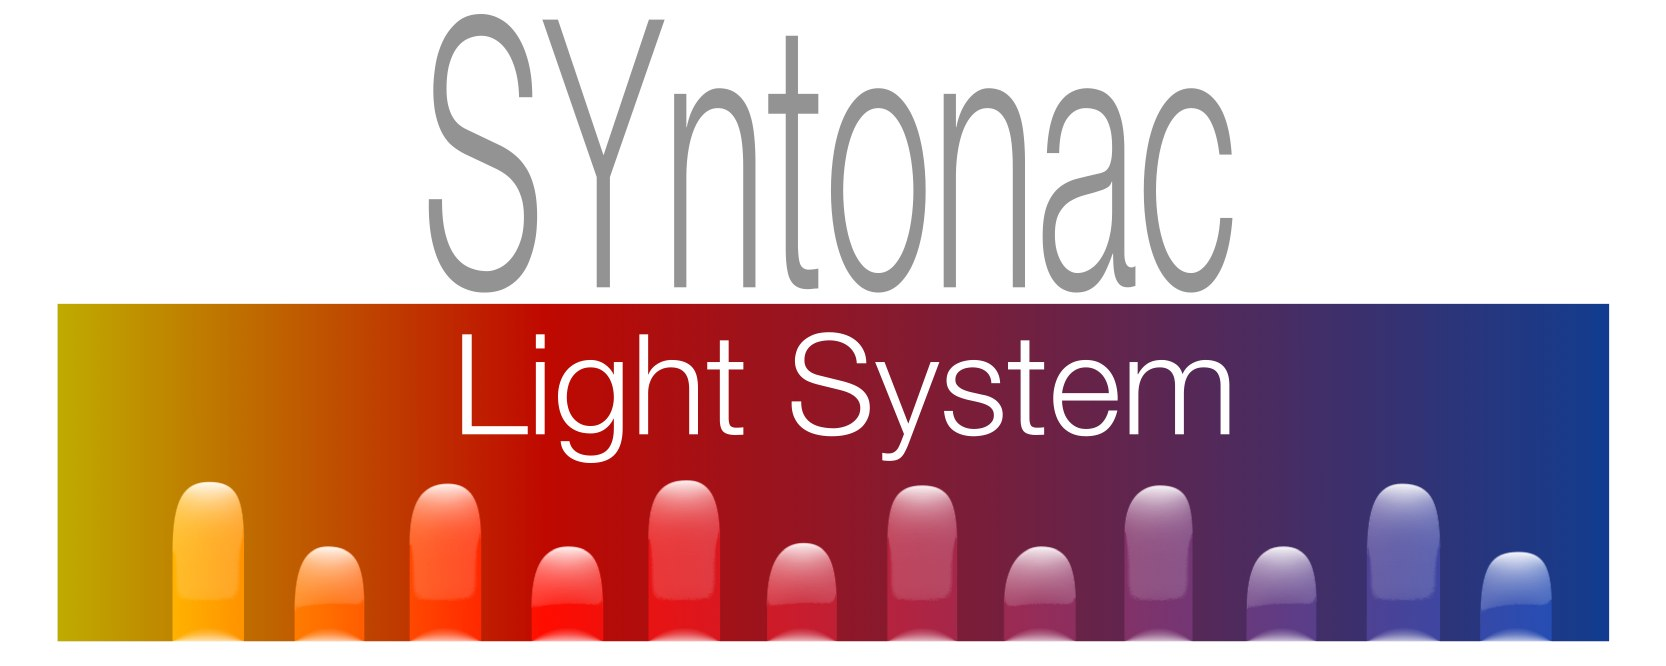 SYntonac1.1.2 Kopie.jpg